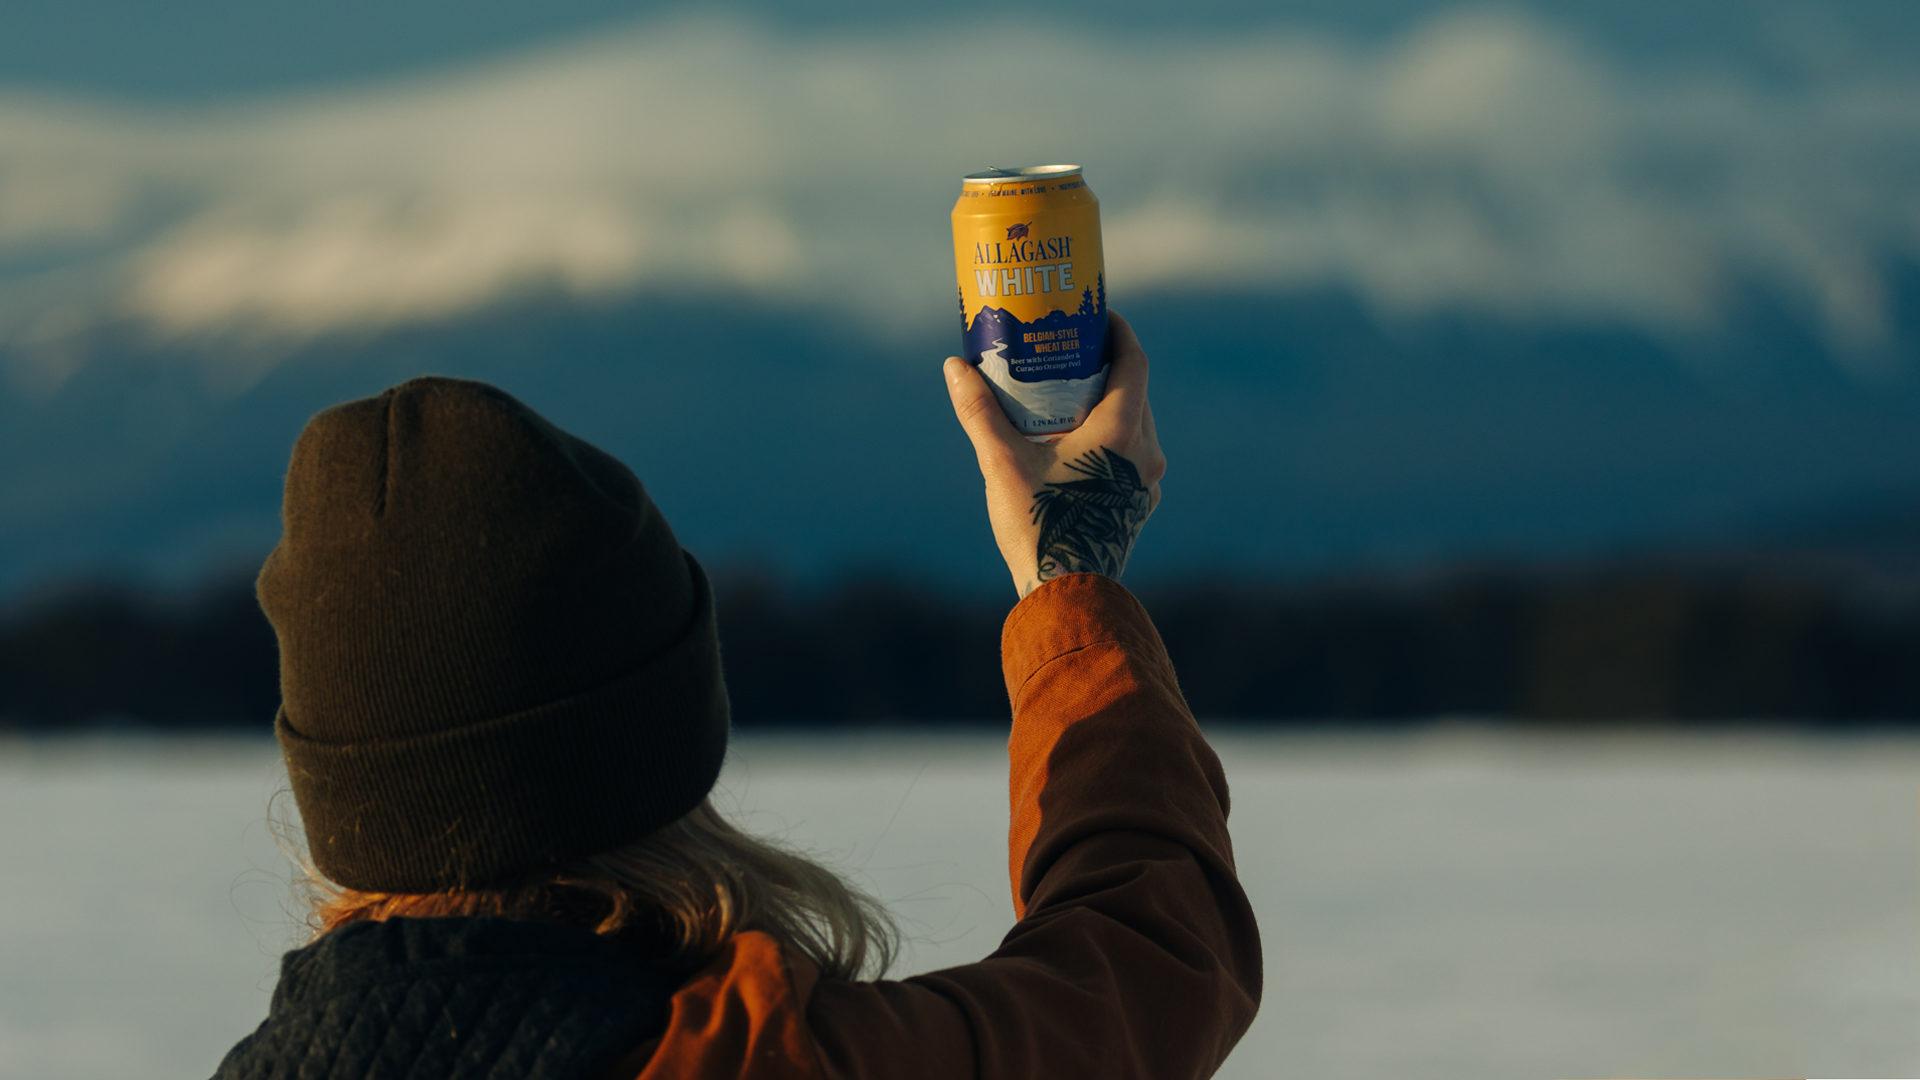 Allagash White in a can